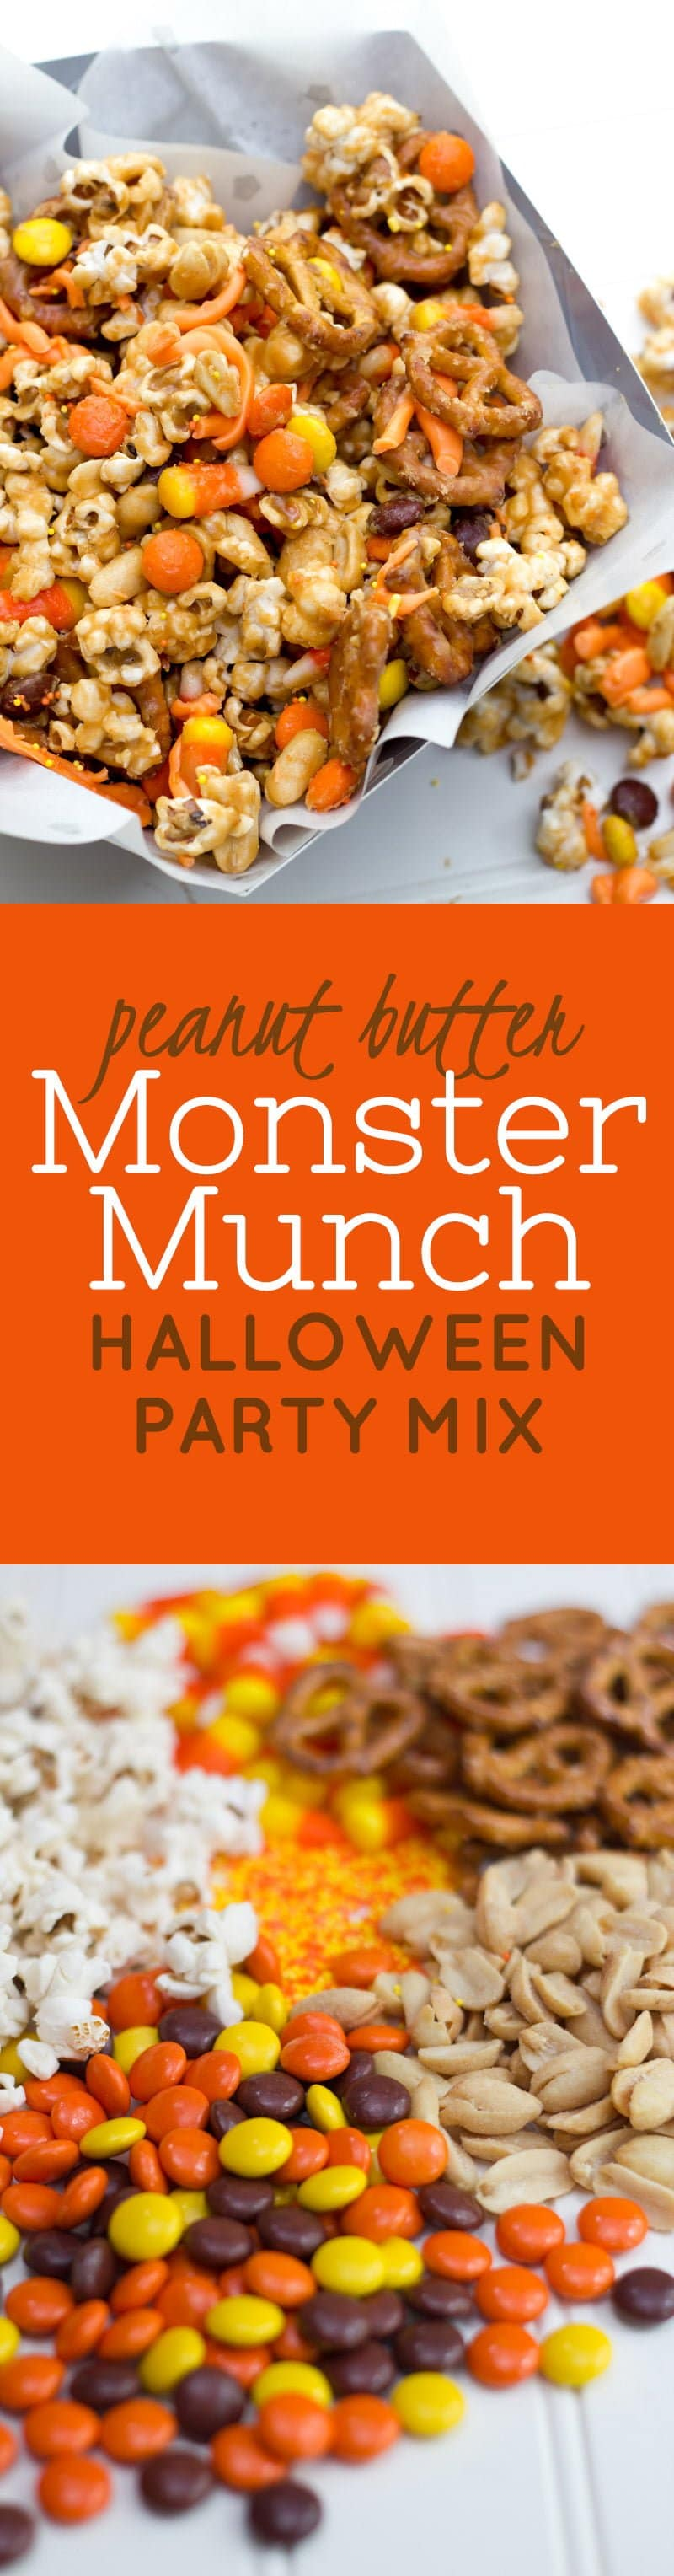 Peanut Butter Halloween Party Mix